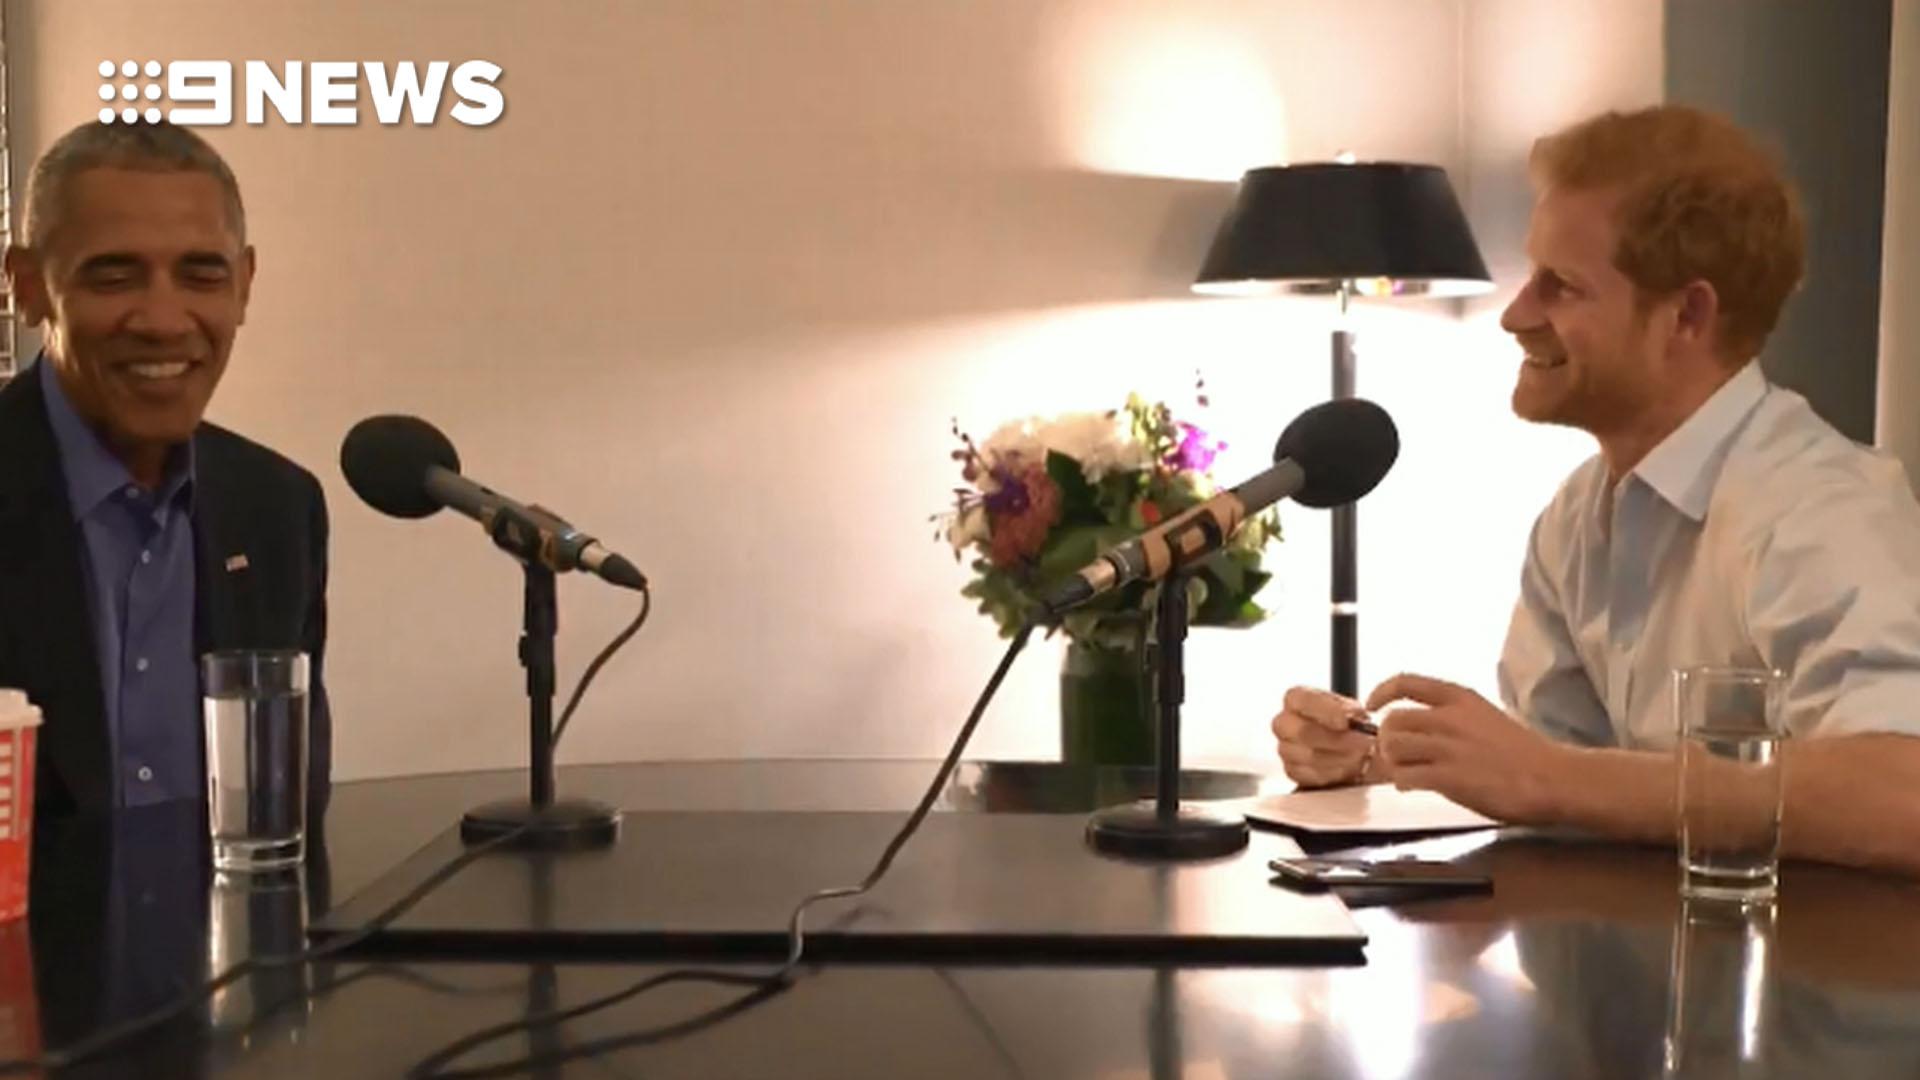 Prince Harry interviews  Barack Obama